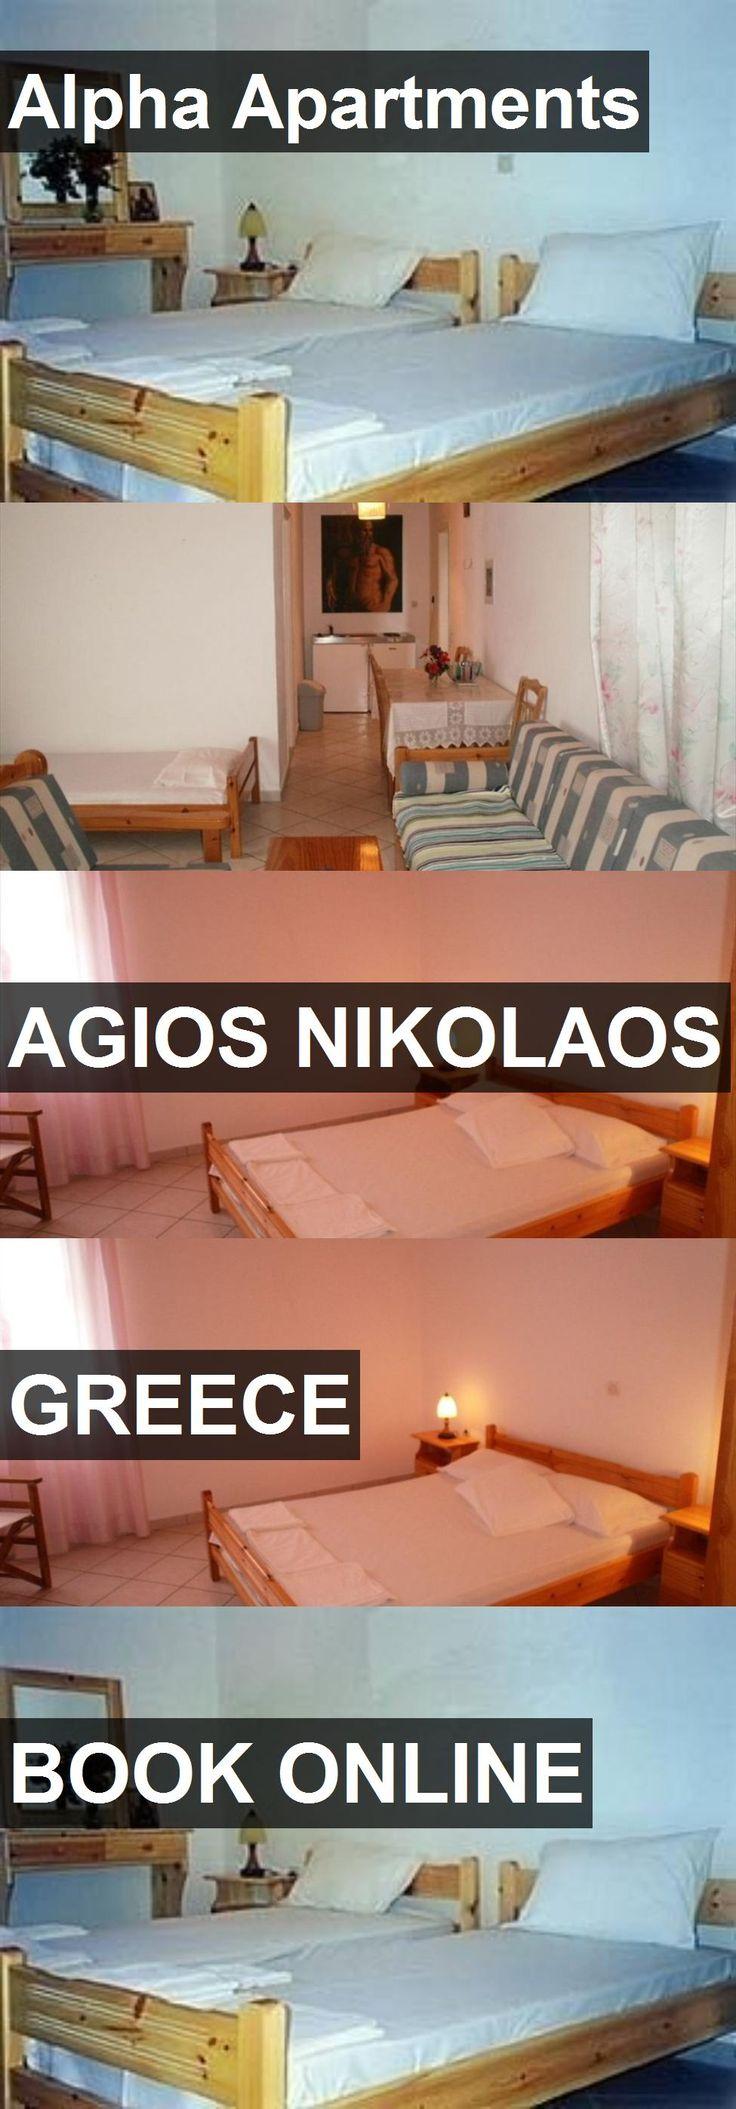 Alpha Apartments in Agios Nikolaos, Greece. For more information, photos, reviews and best prices please follow the link. #Greece #AgiosNikolaos #travel #vacation #apartment